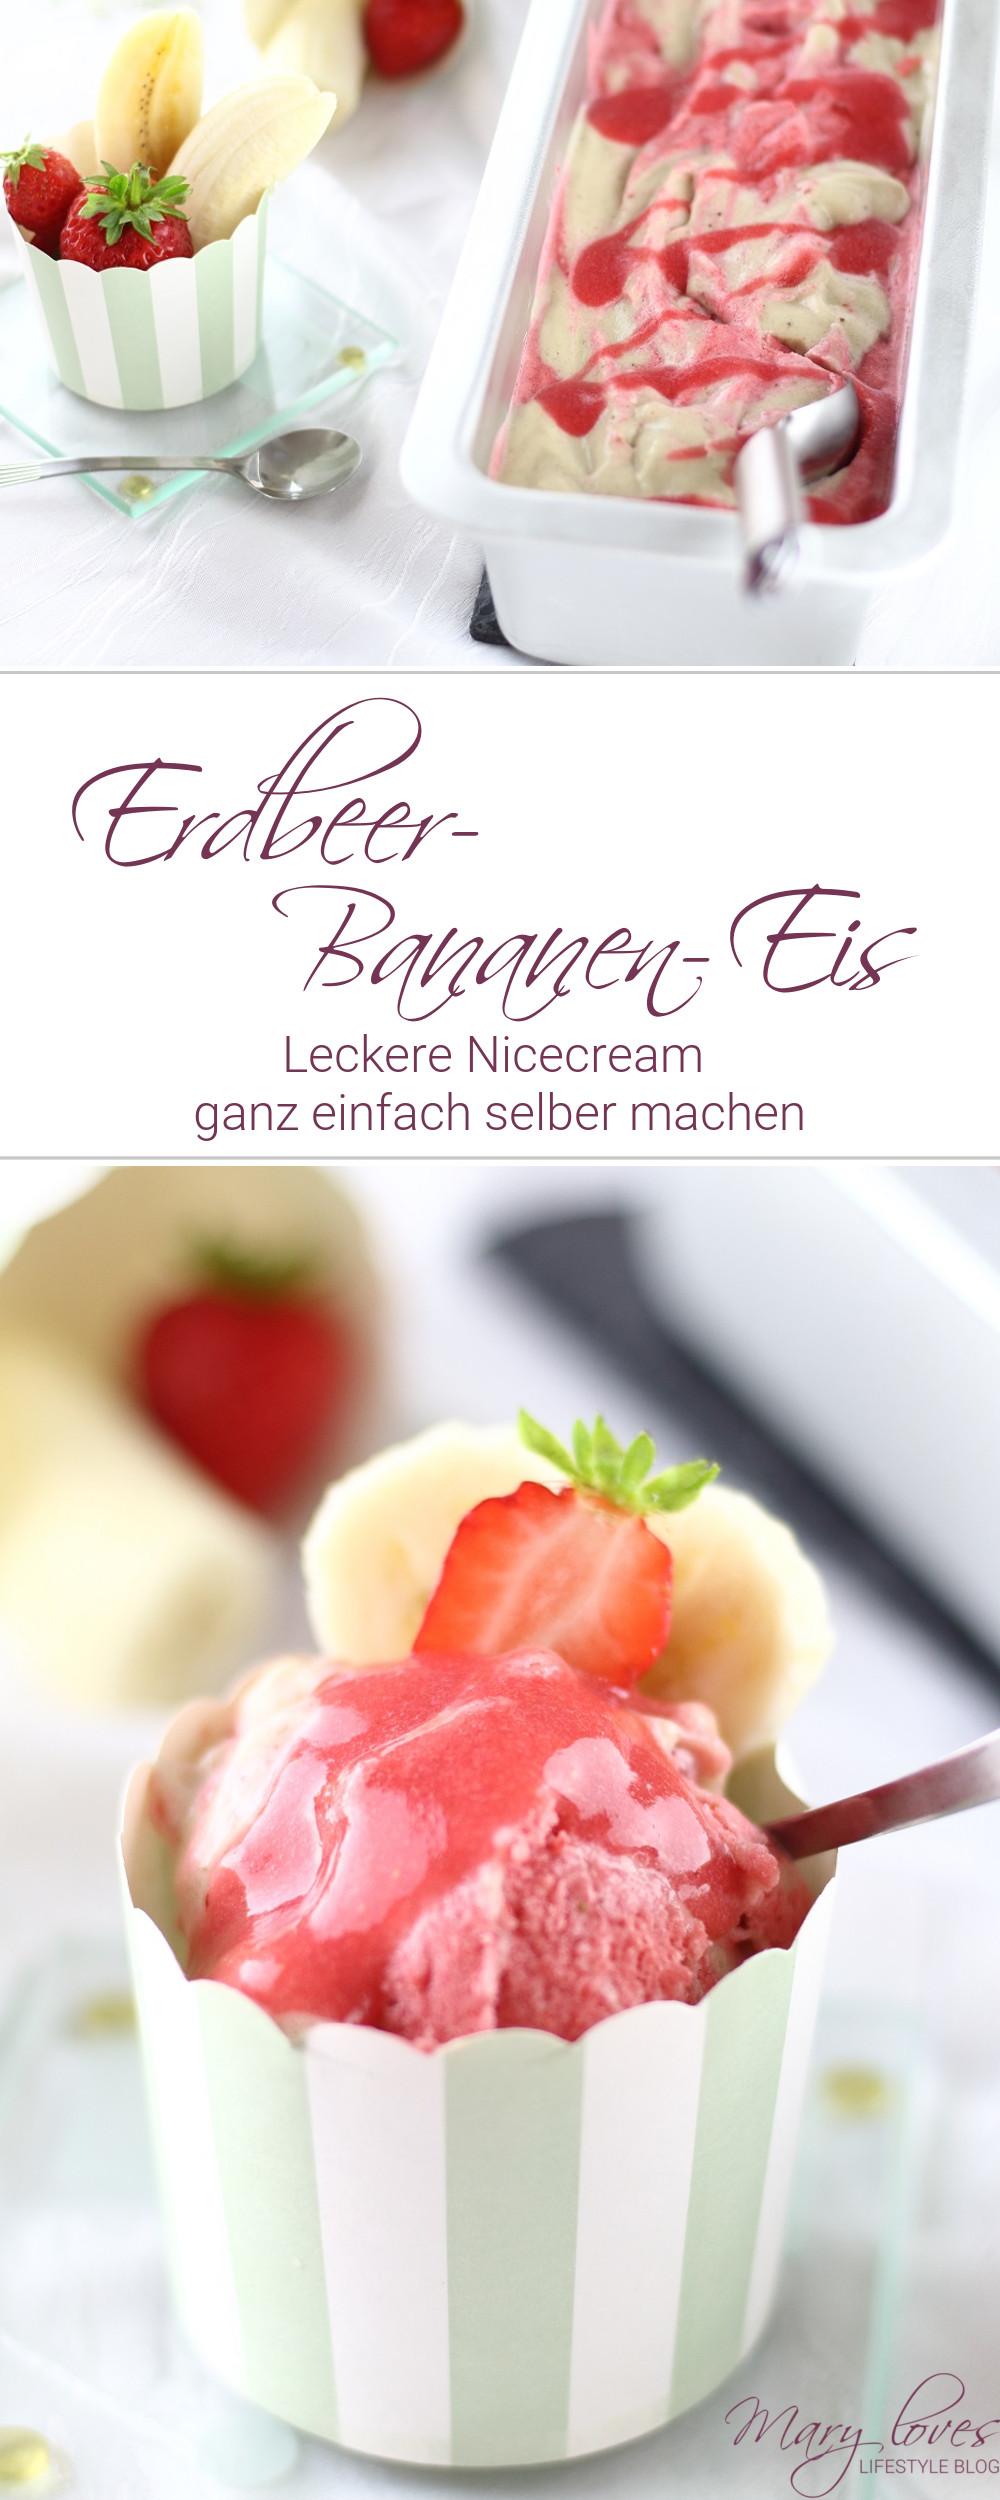 Nicecream - Leckeres Erdbeer-Bananen-Eis ohne Eismaschine - #nicecream #erdbeereis #bananeneis #erdbeerbananeneis #eiscreme #zuckerfrei #erdbeerzeit #bananen #erdbeeren #eisrezept #eis